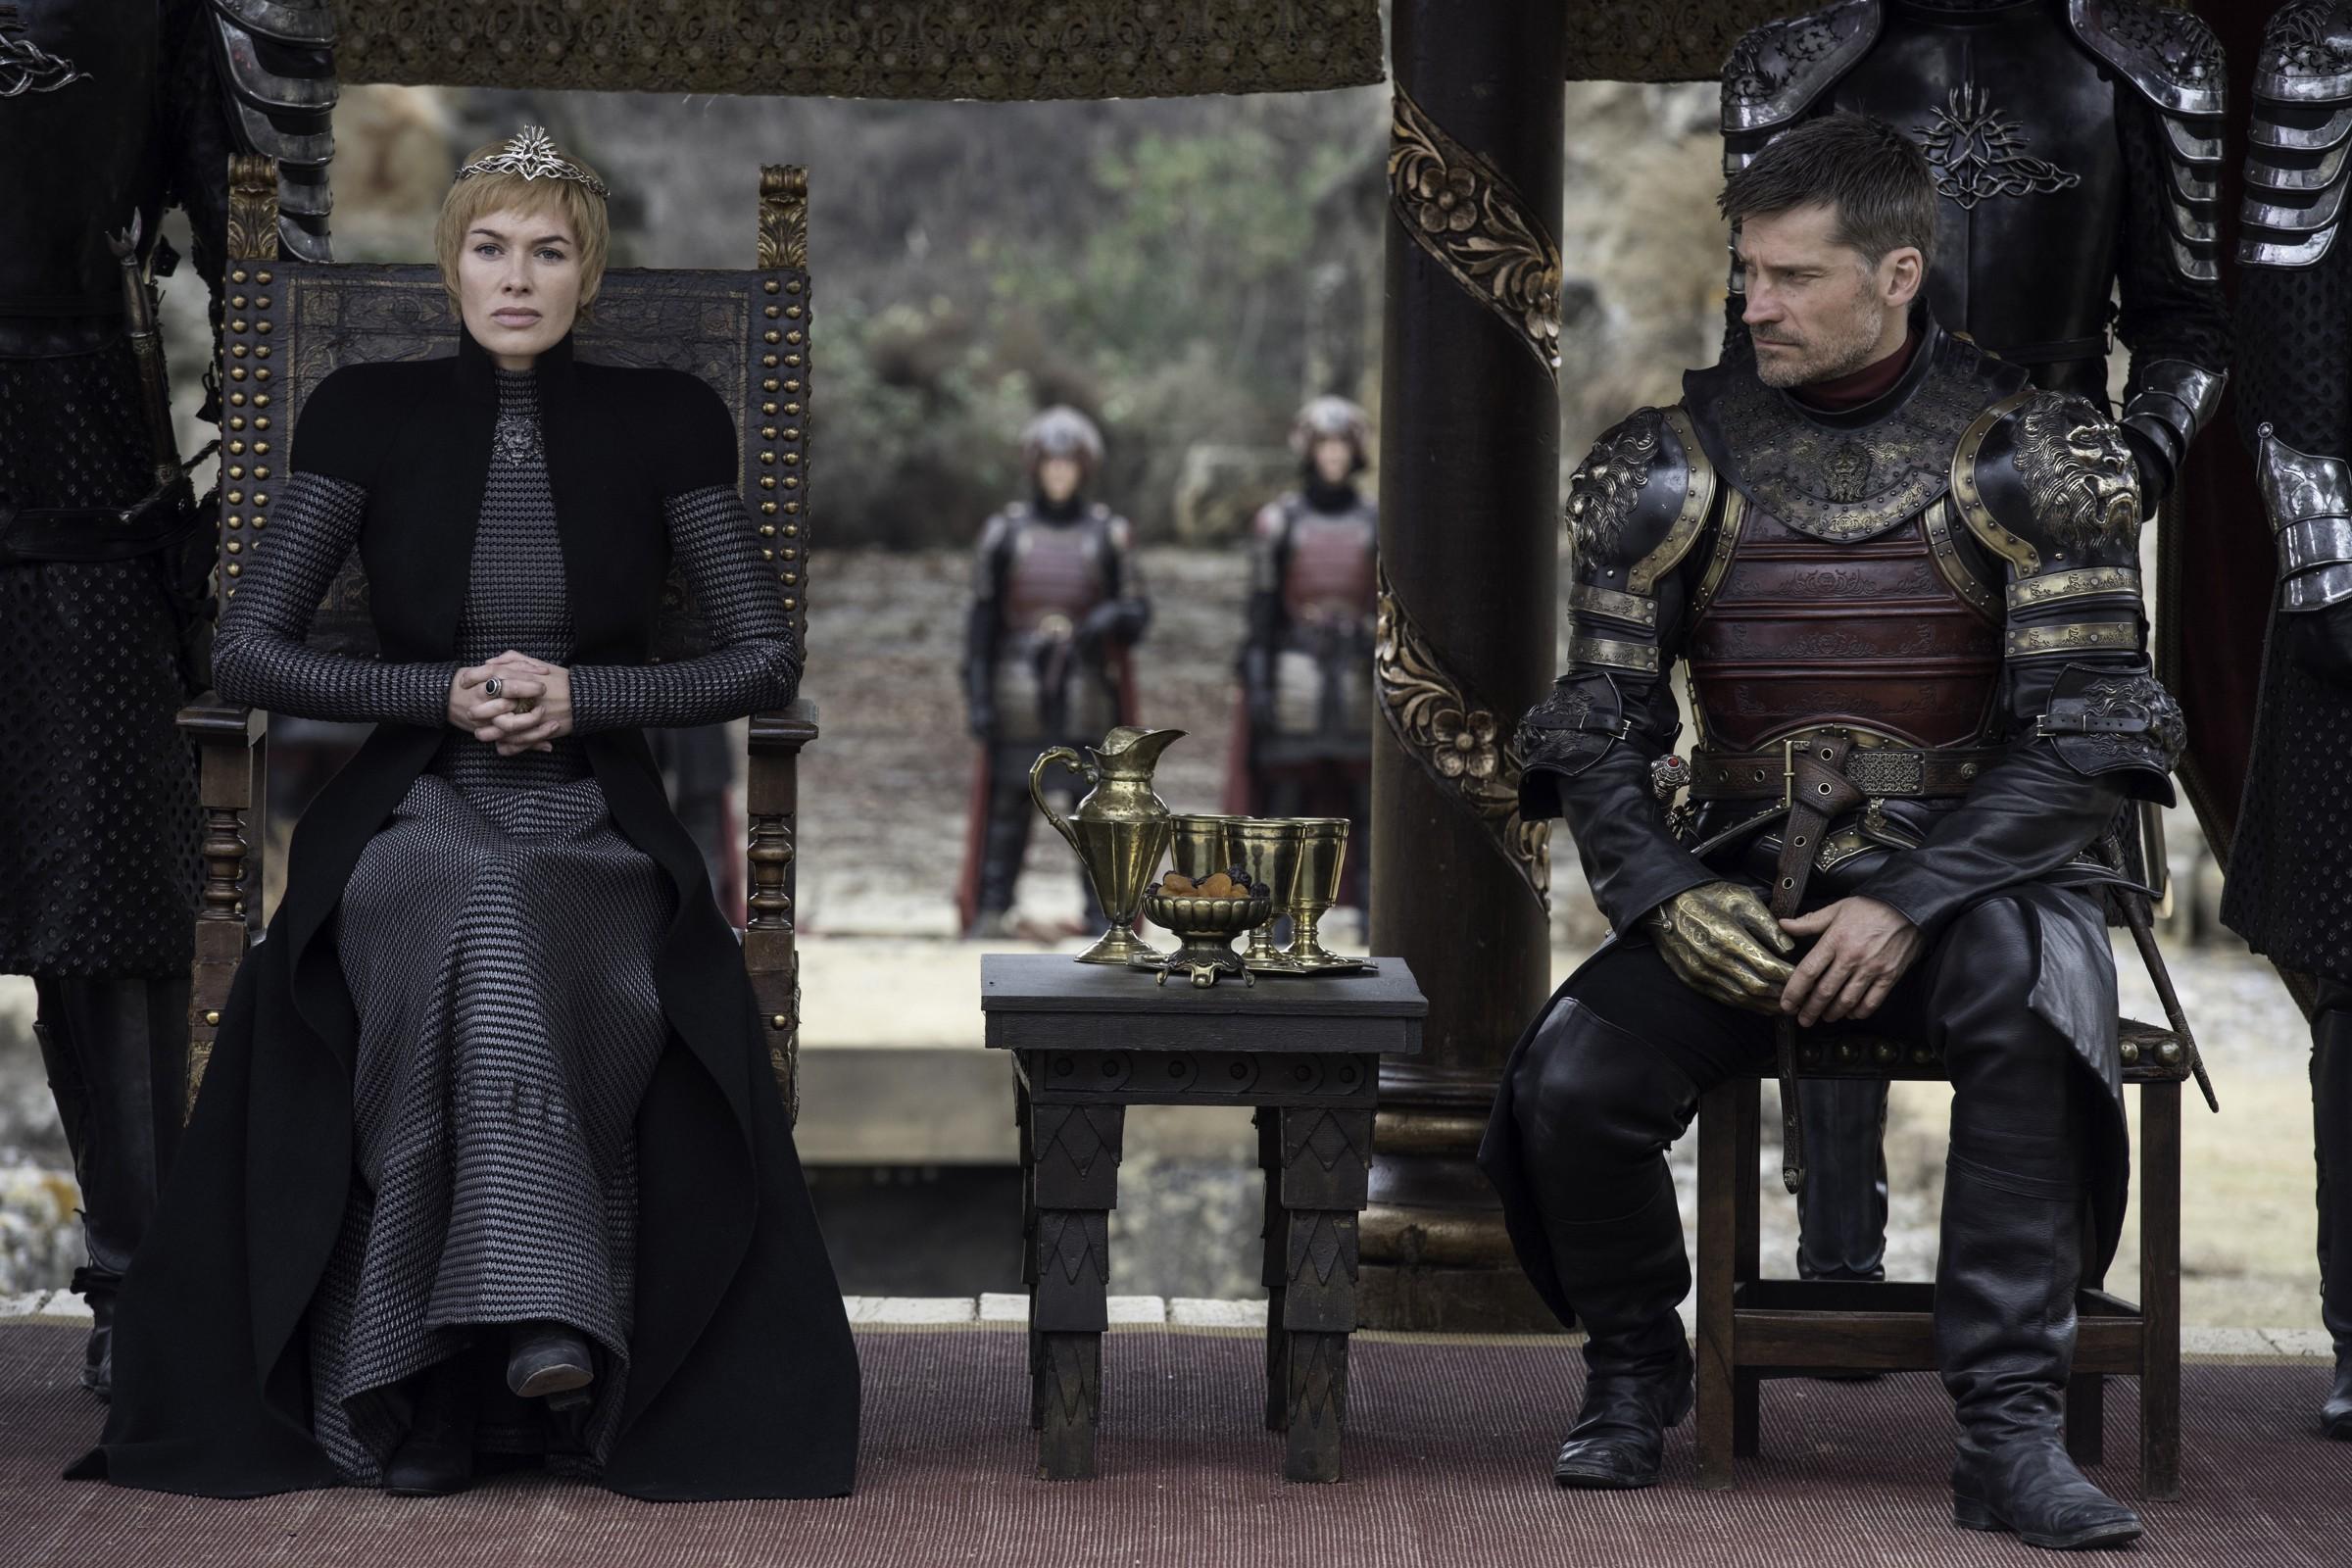 game of thrones season 7 episode 4 1080p torrent